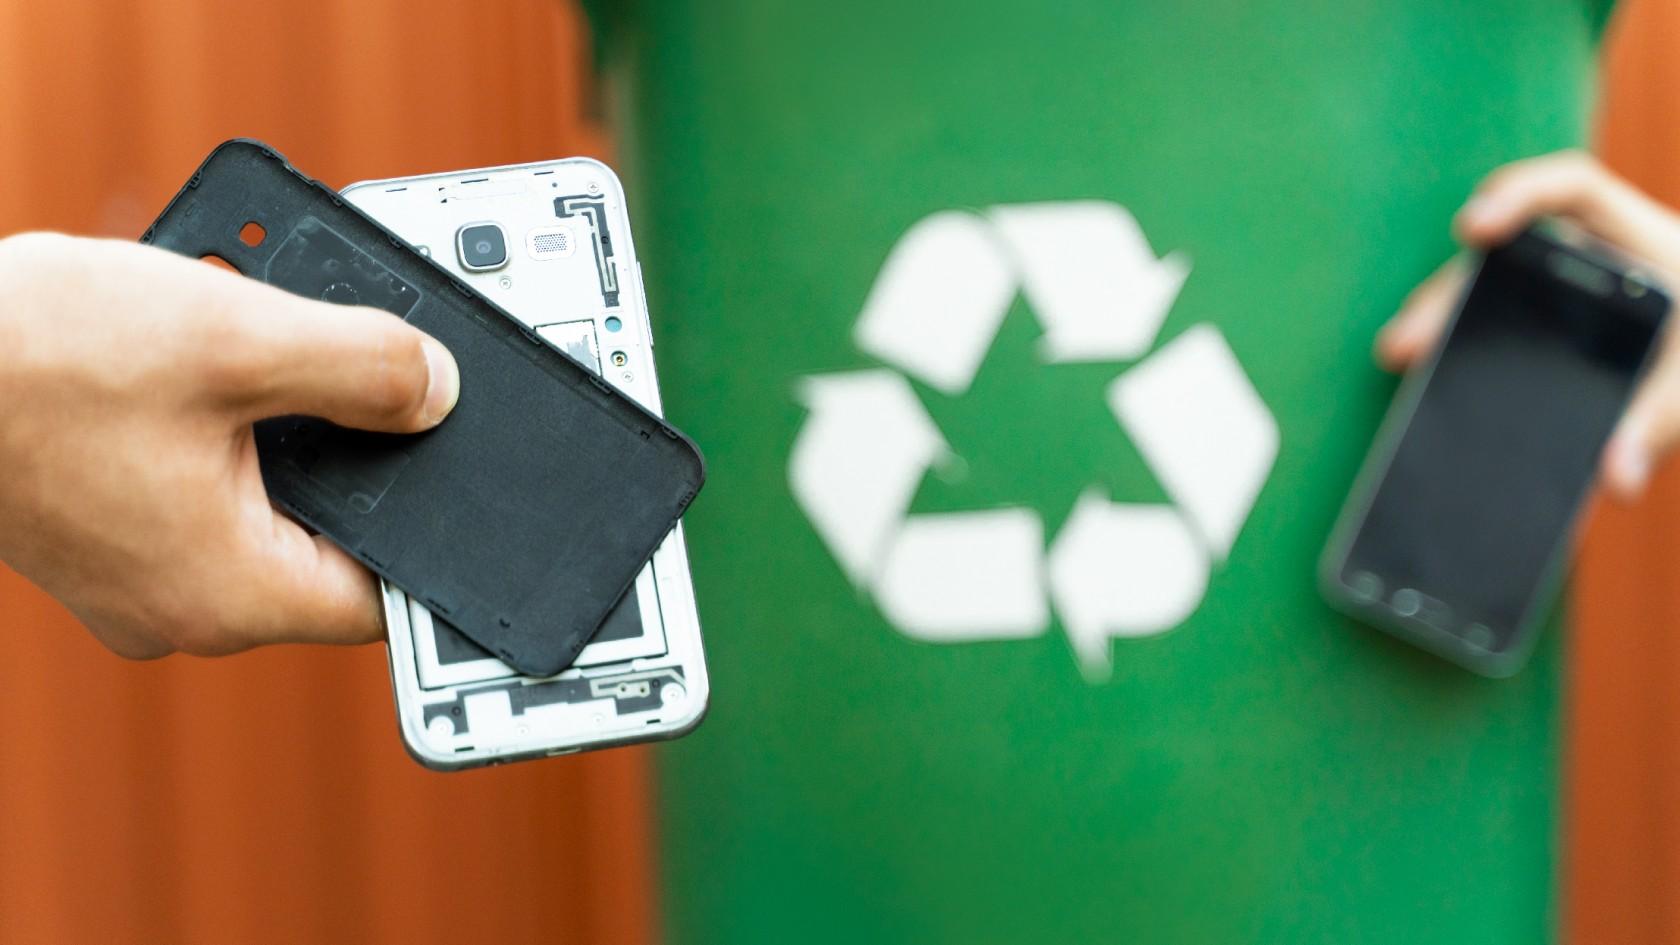 http://www.raeecciona.org/wp-content/uploads/2020/01/Blog_Motivos-para-reciclar-3-3-1680x945.jpg